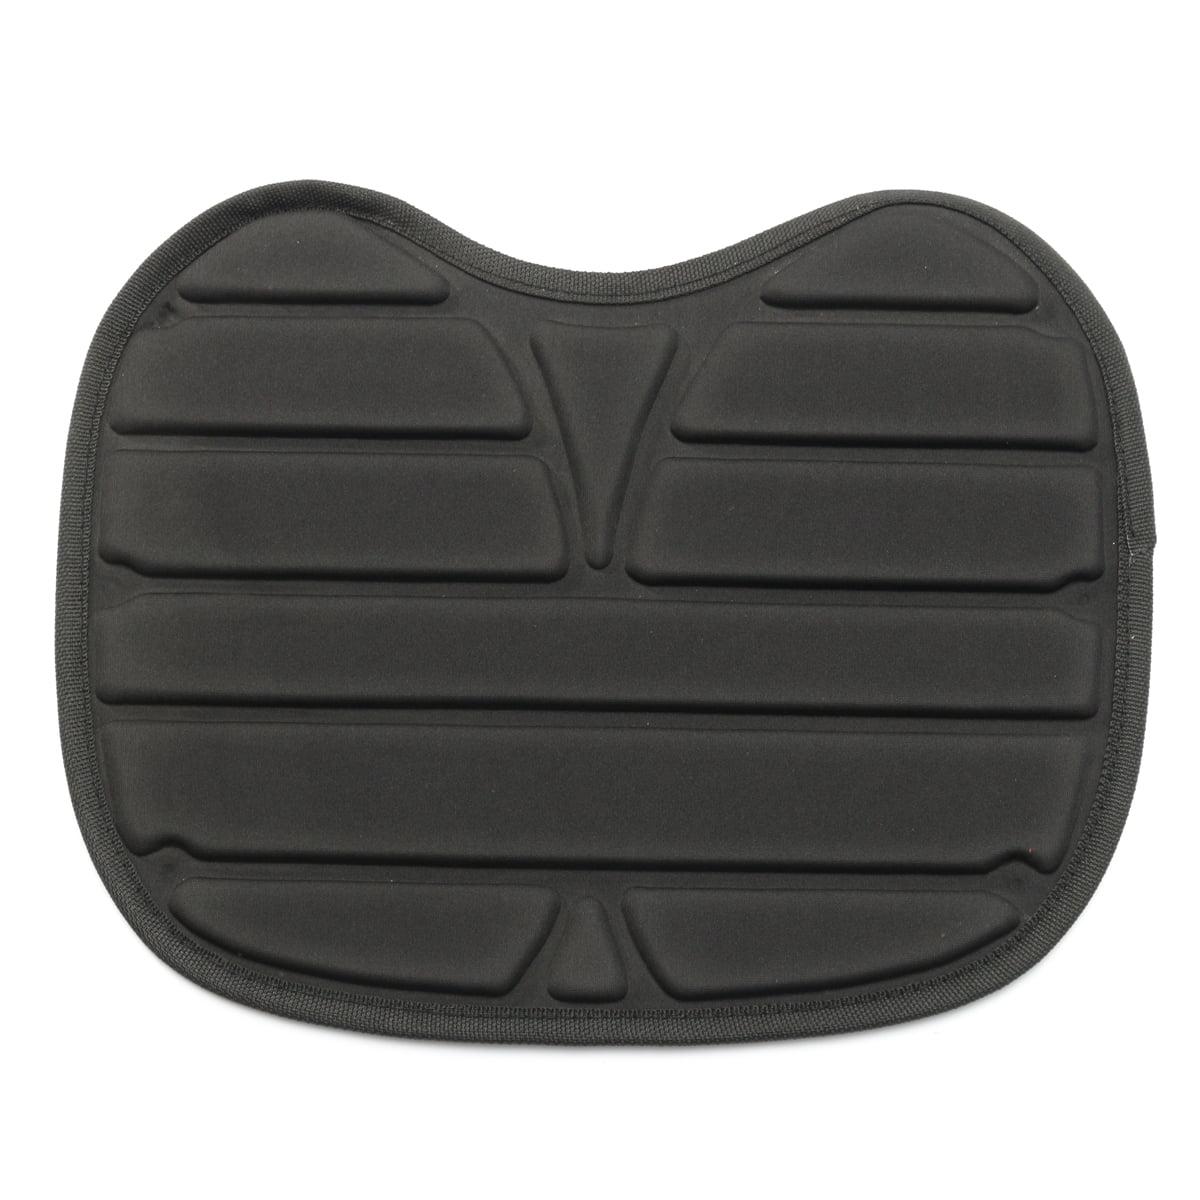 "Kayak Soft Padded Seat Cushion Comfortable Seat Pad EVA For Kayak Canoe Fishing Drift Boat (14.2""x12.2"" inch) by"